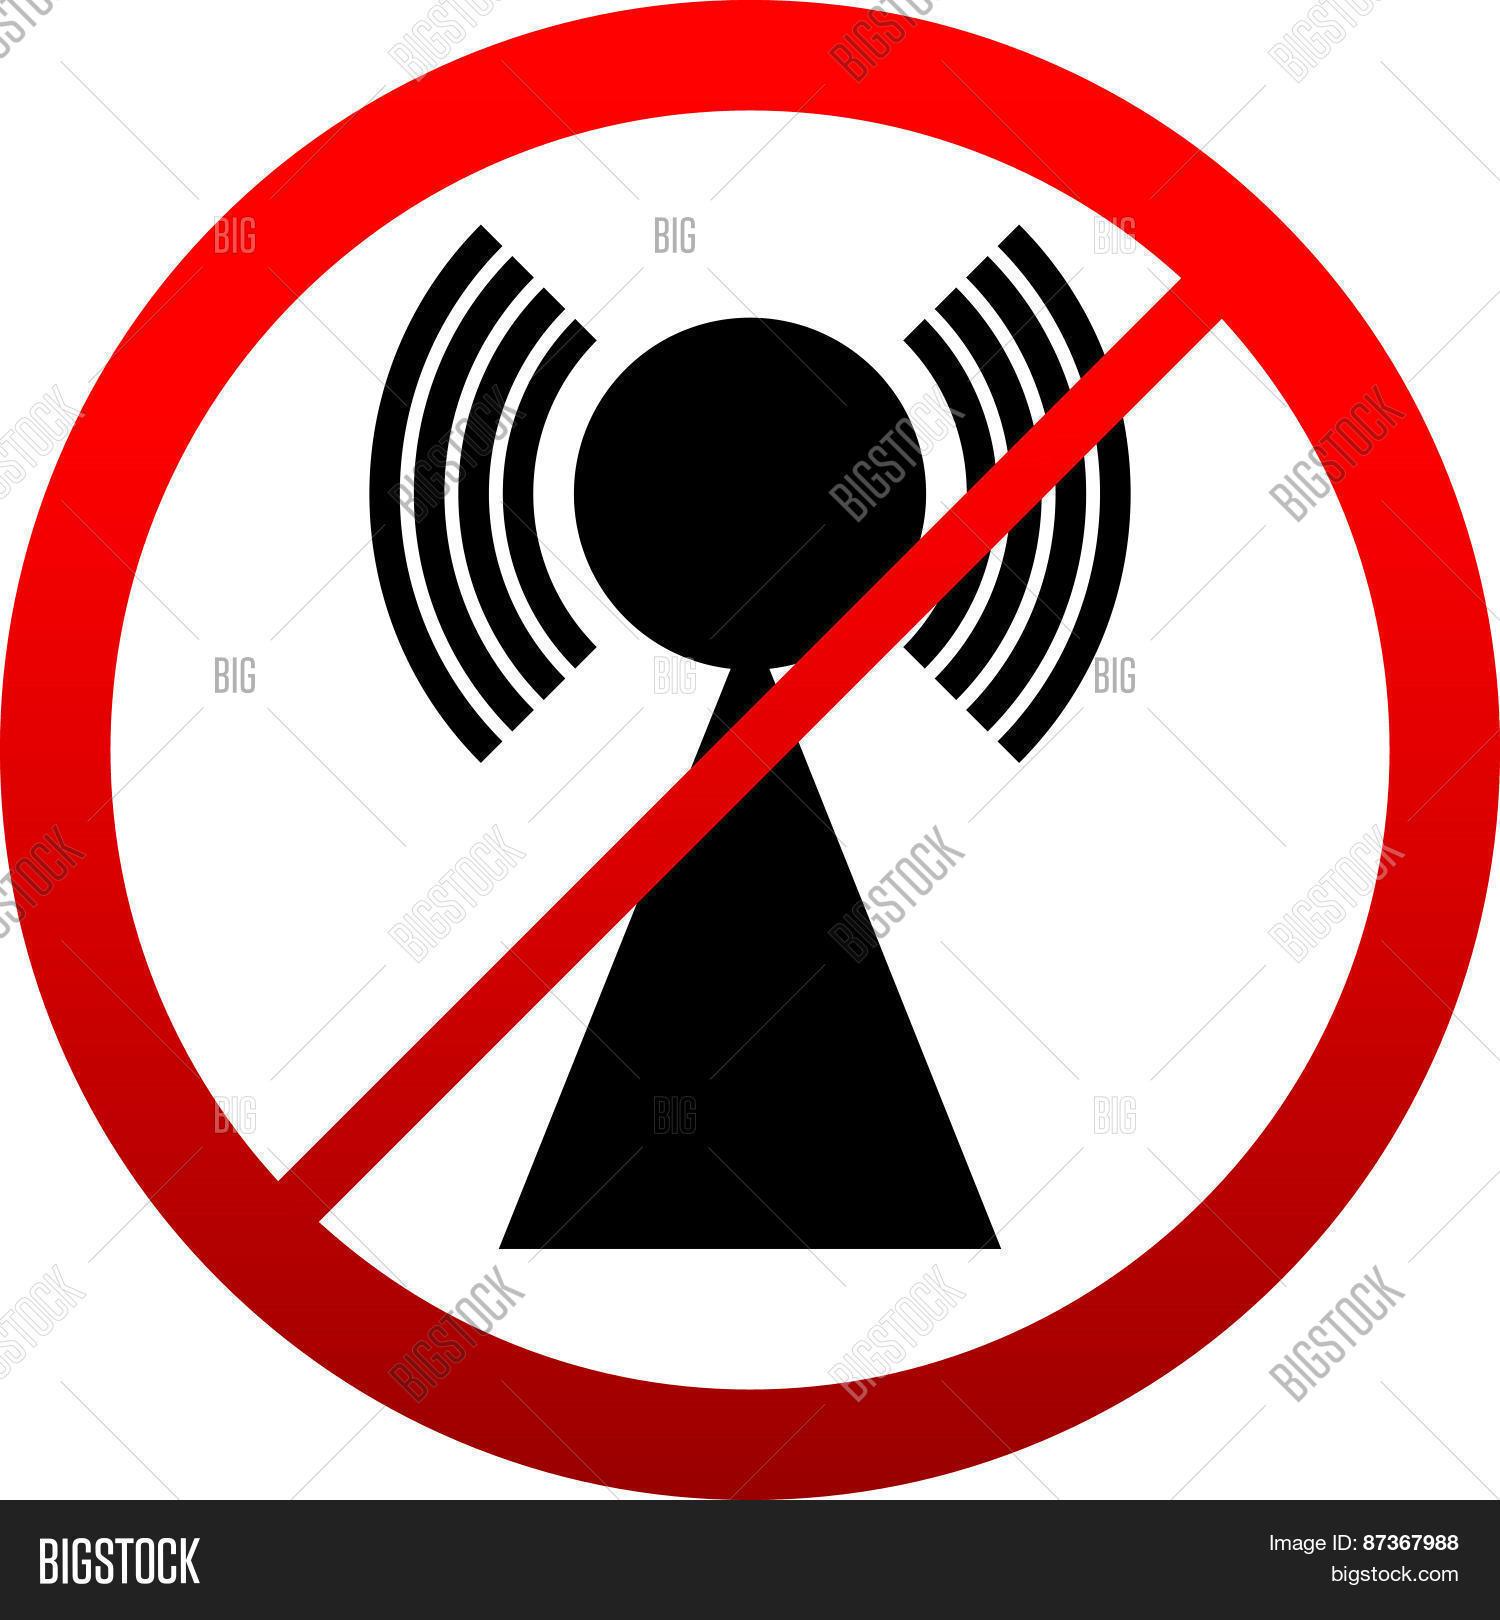 No signal sign bad antenna no vector photo bigstock bad antenna no internet connection concepts jamming interference icon buycottarizona Images